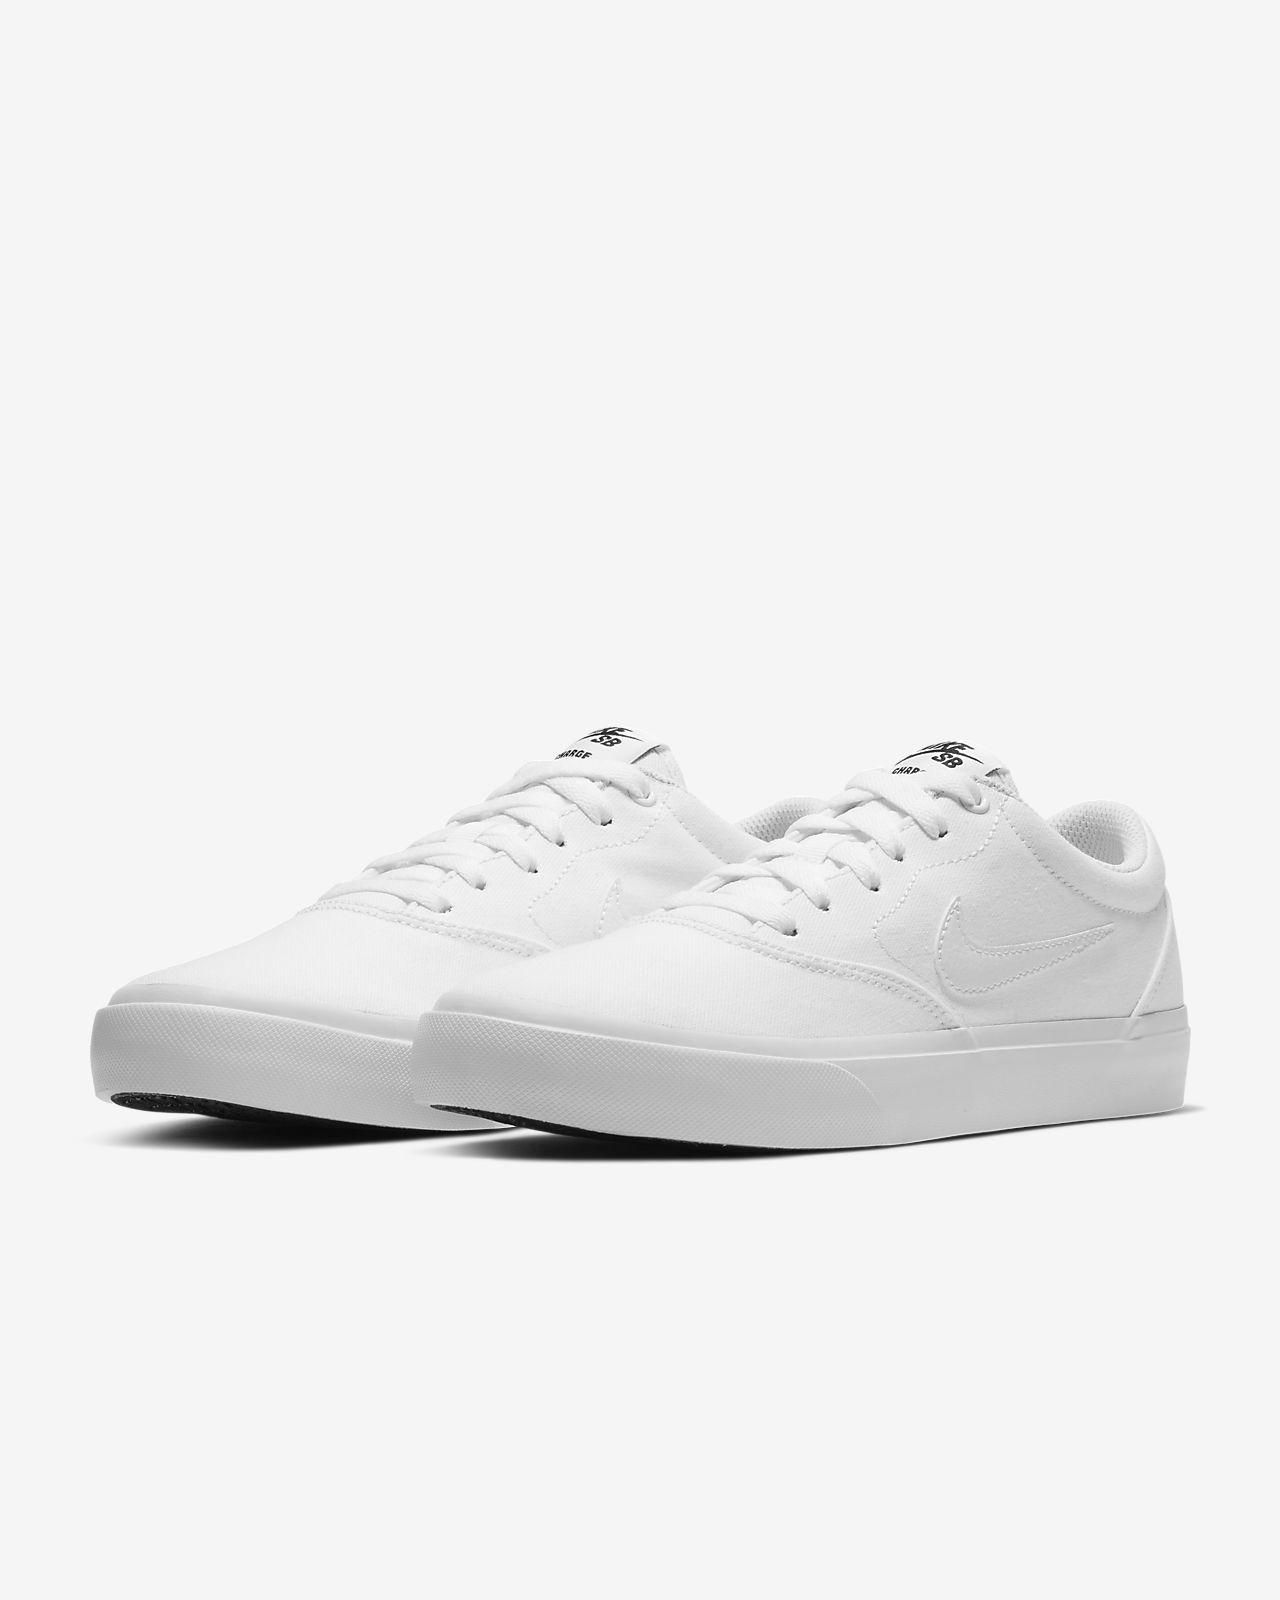 Nike SB Charge Canvas Women's Skate Shoe